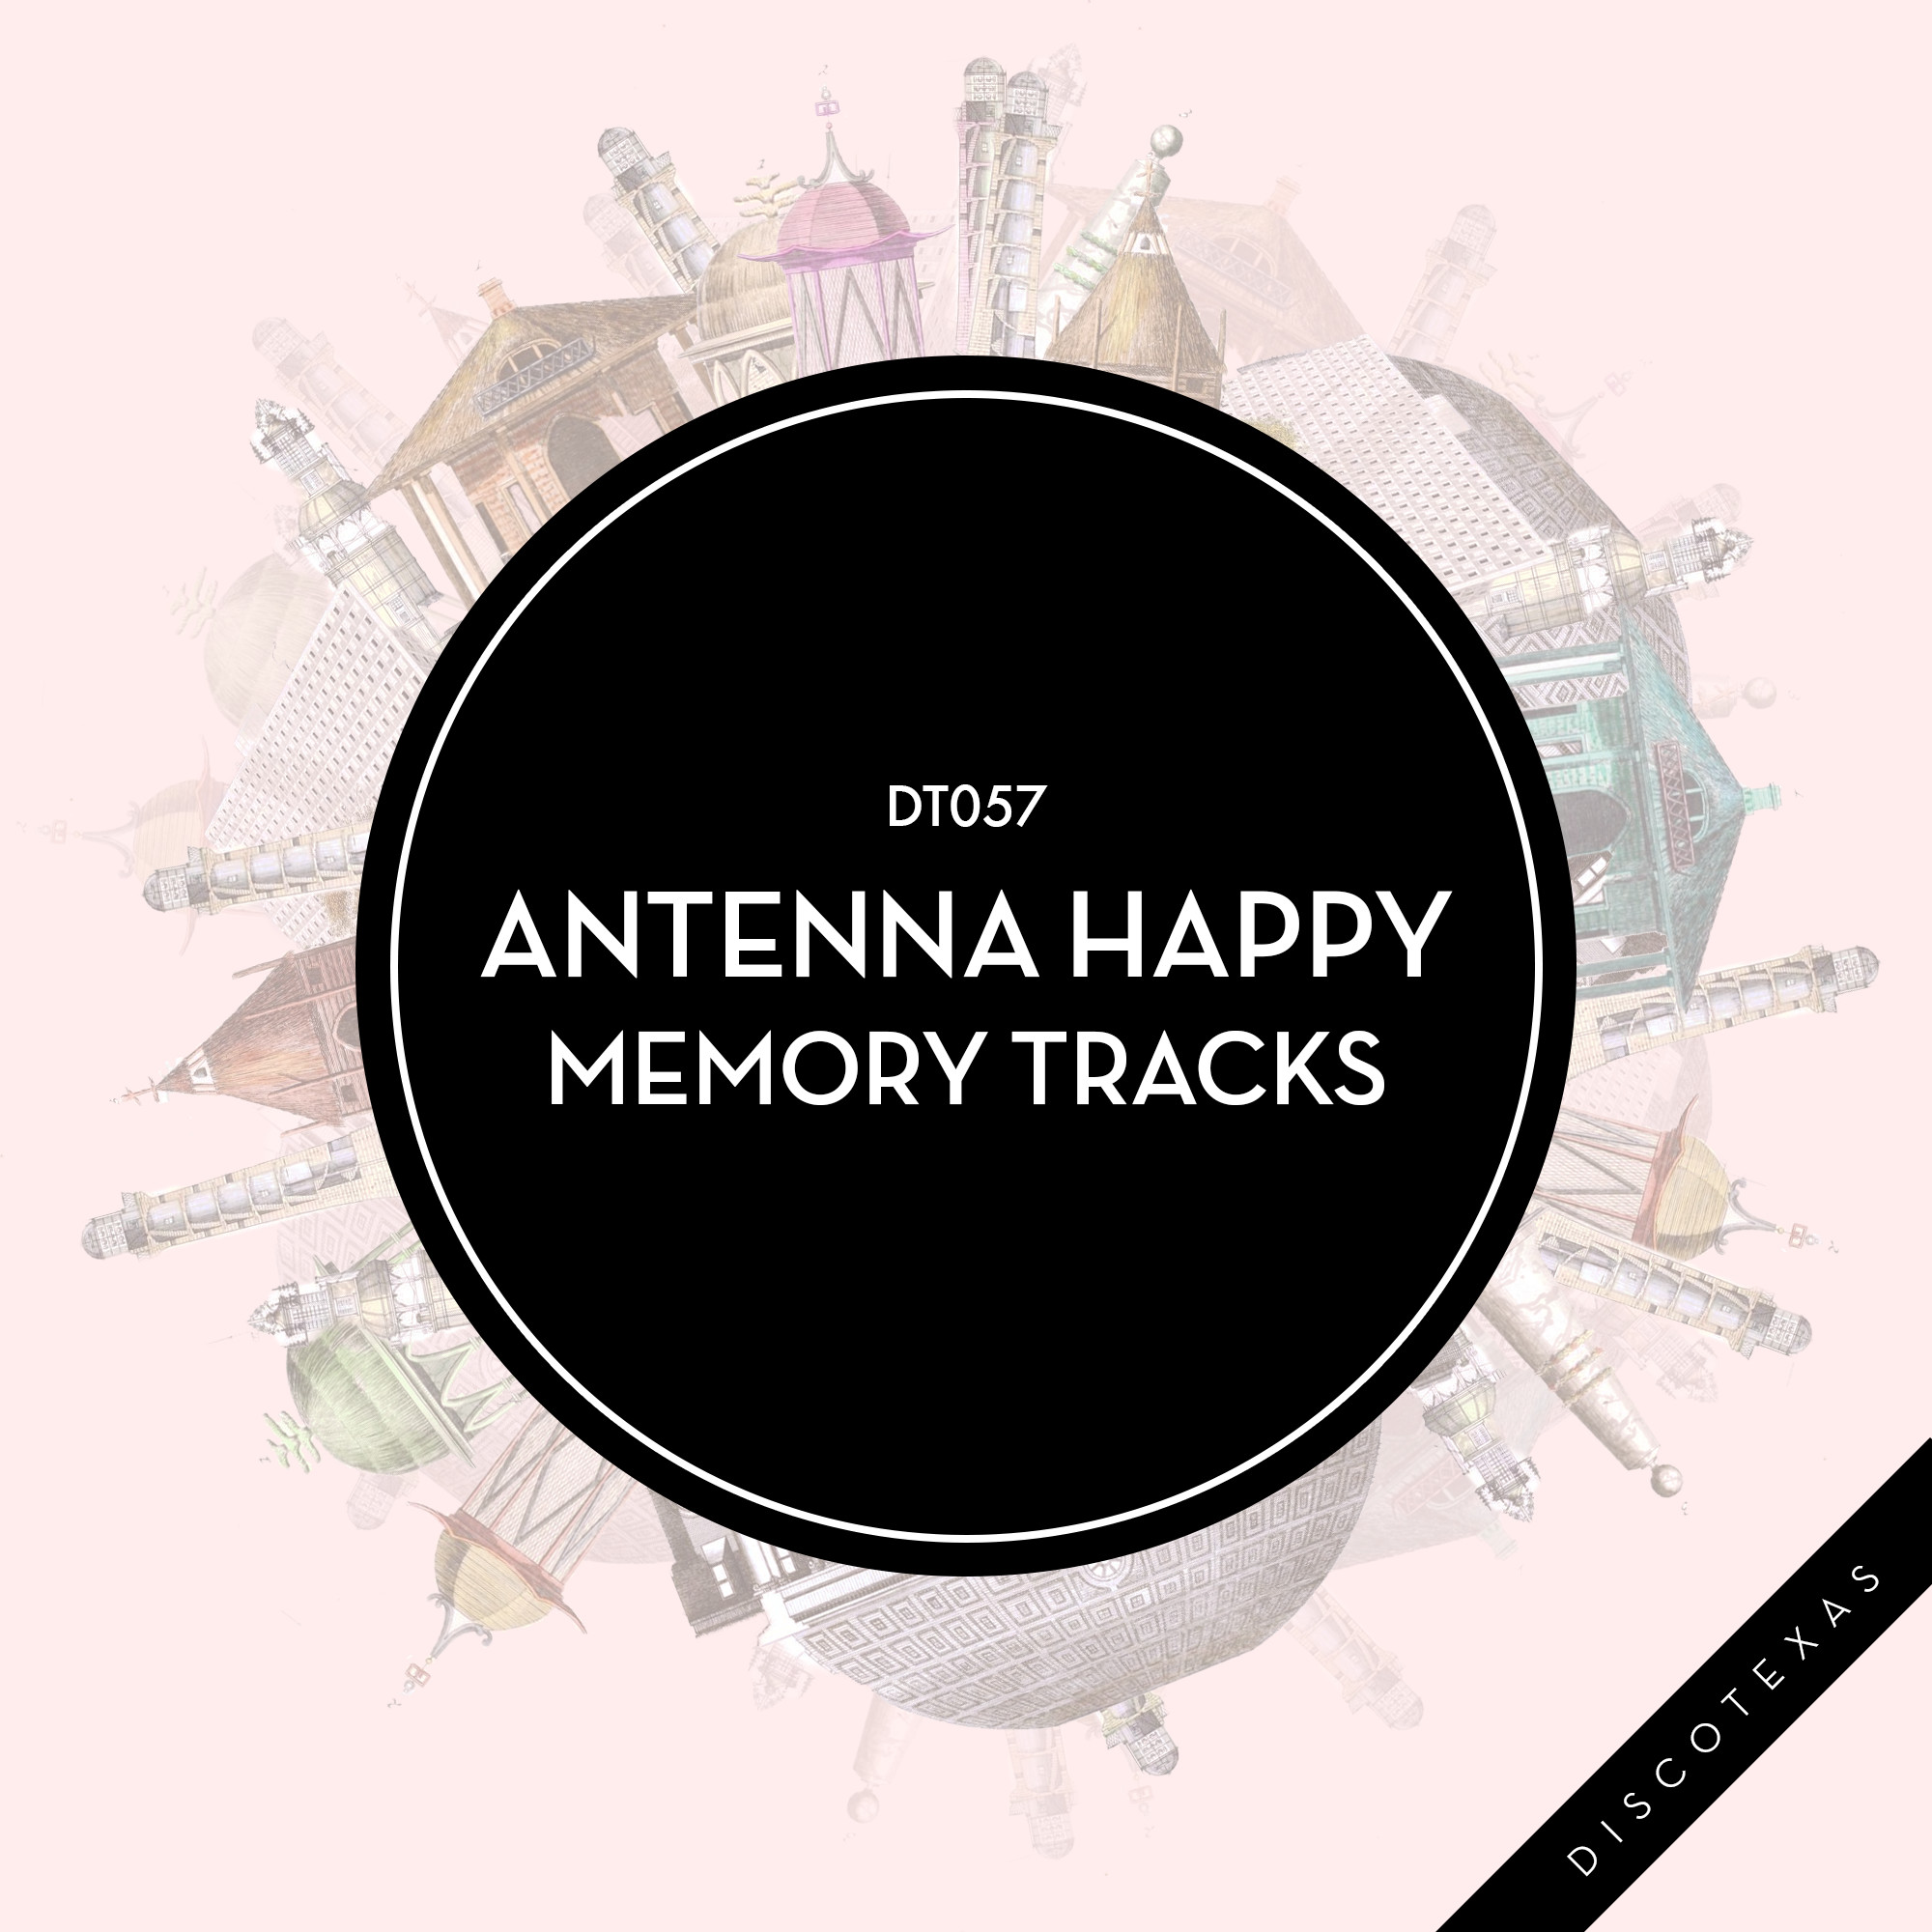 DT057: Antenna Happy - Memory Tracks